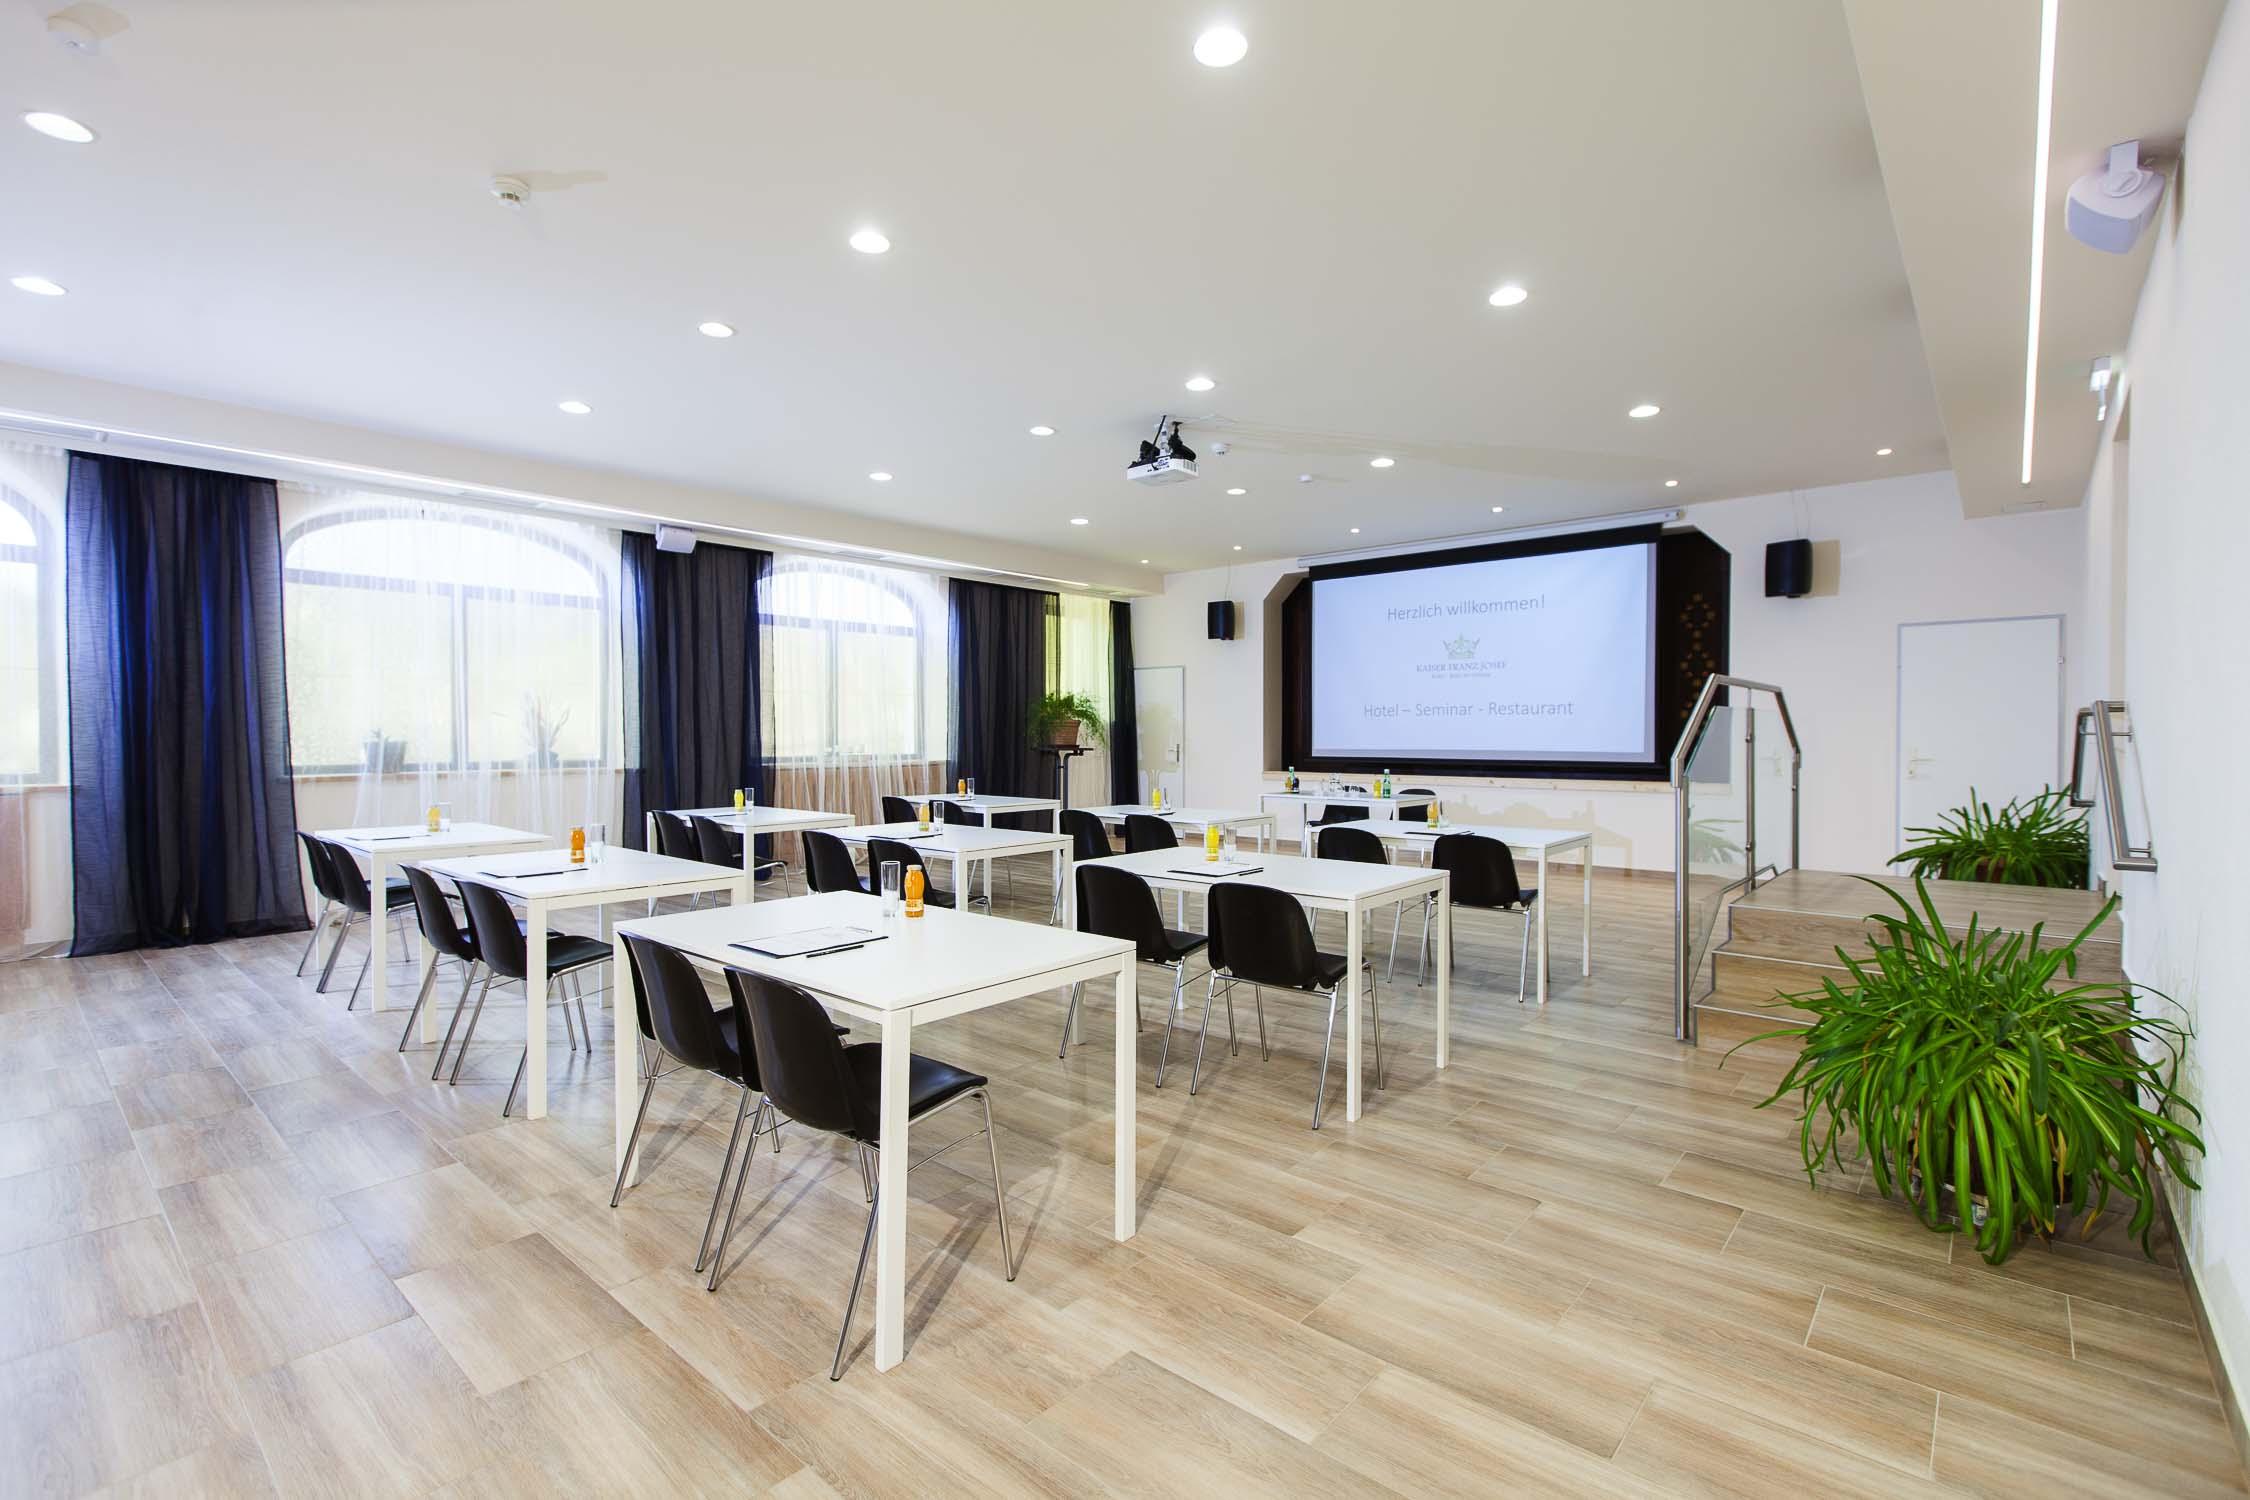 Hotelfotograf Businesshotel Seminarhotel Seminar 0743-0104.jpg